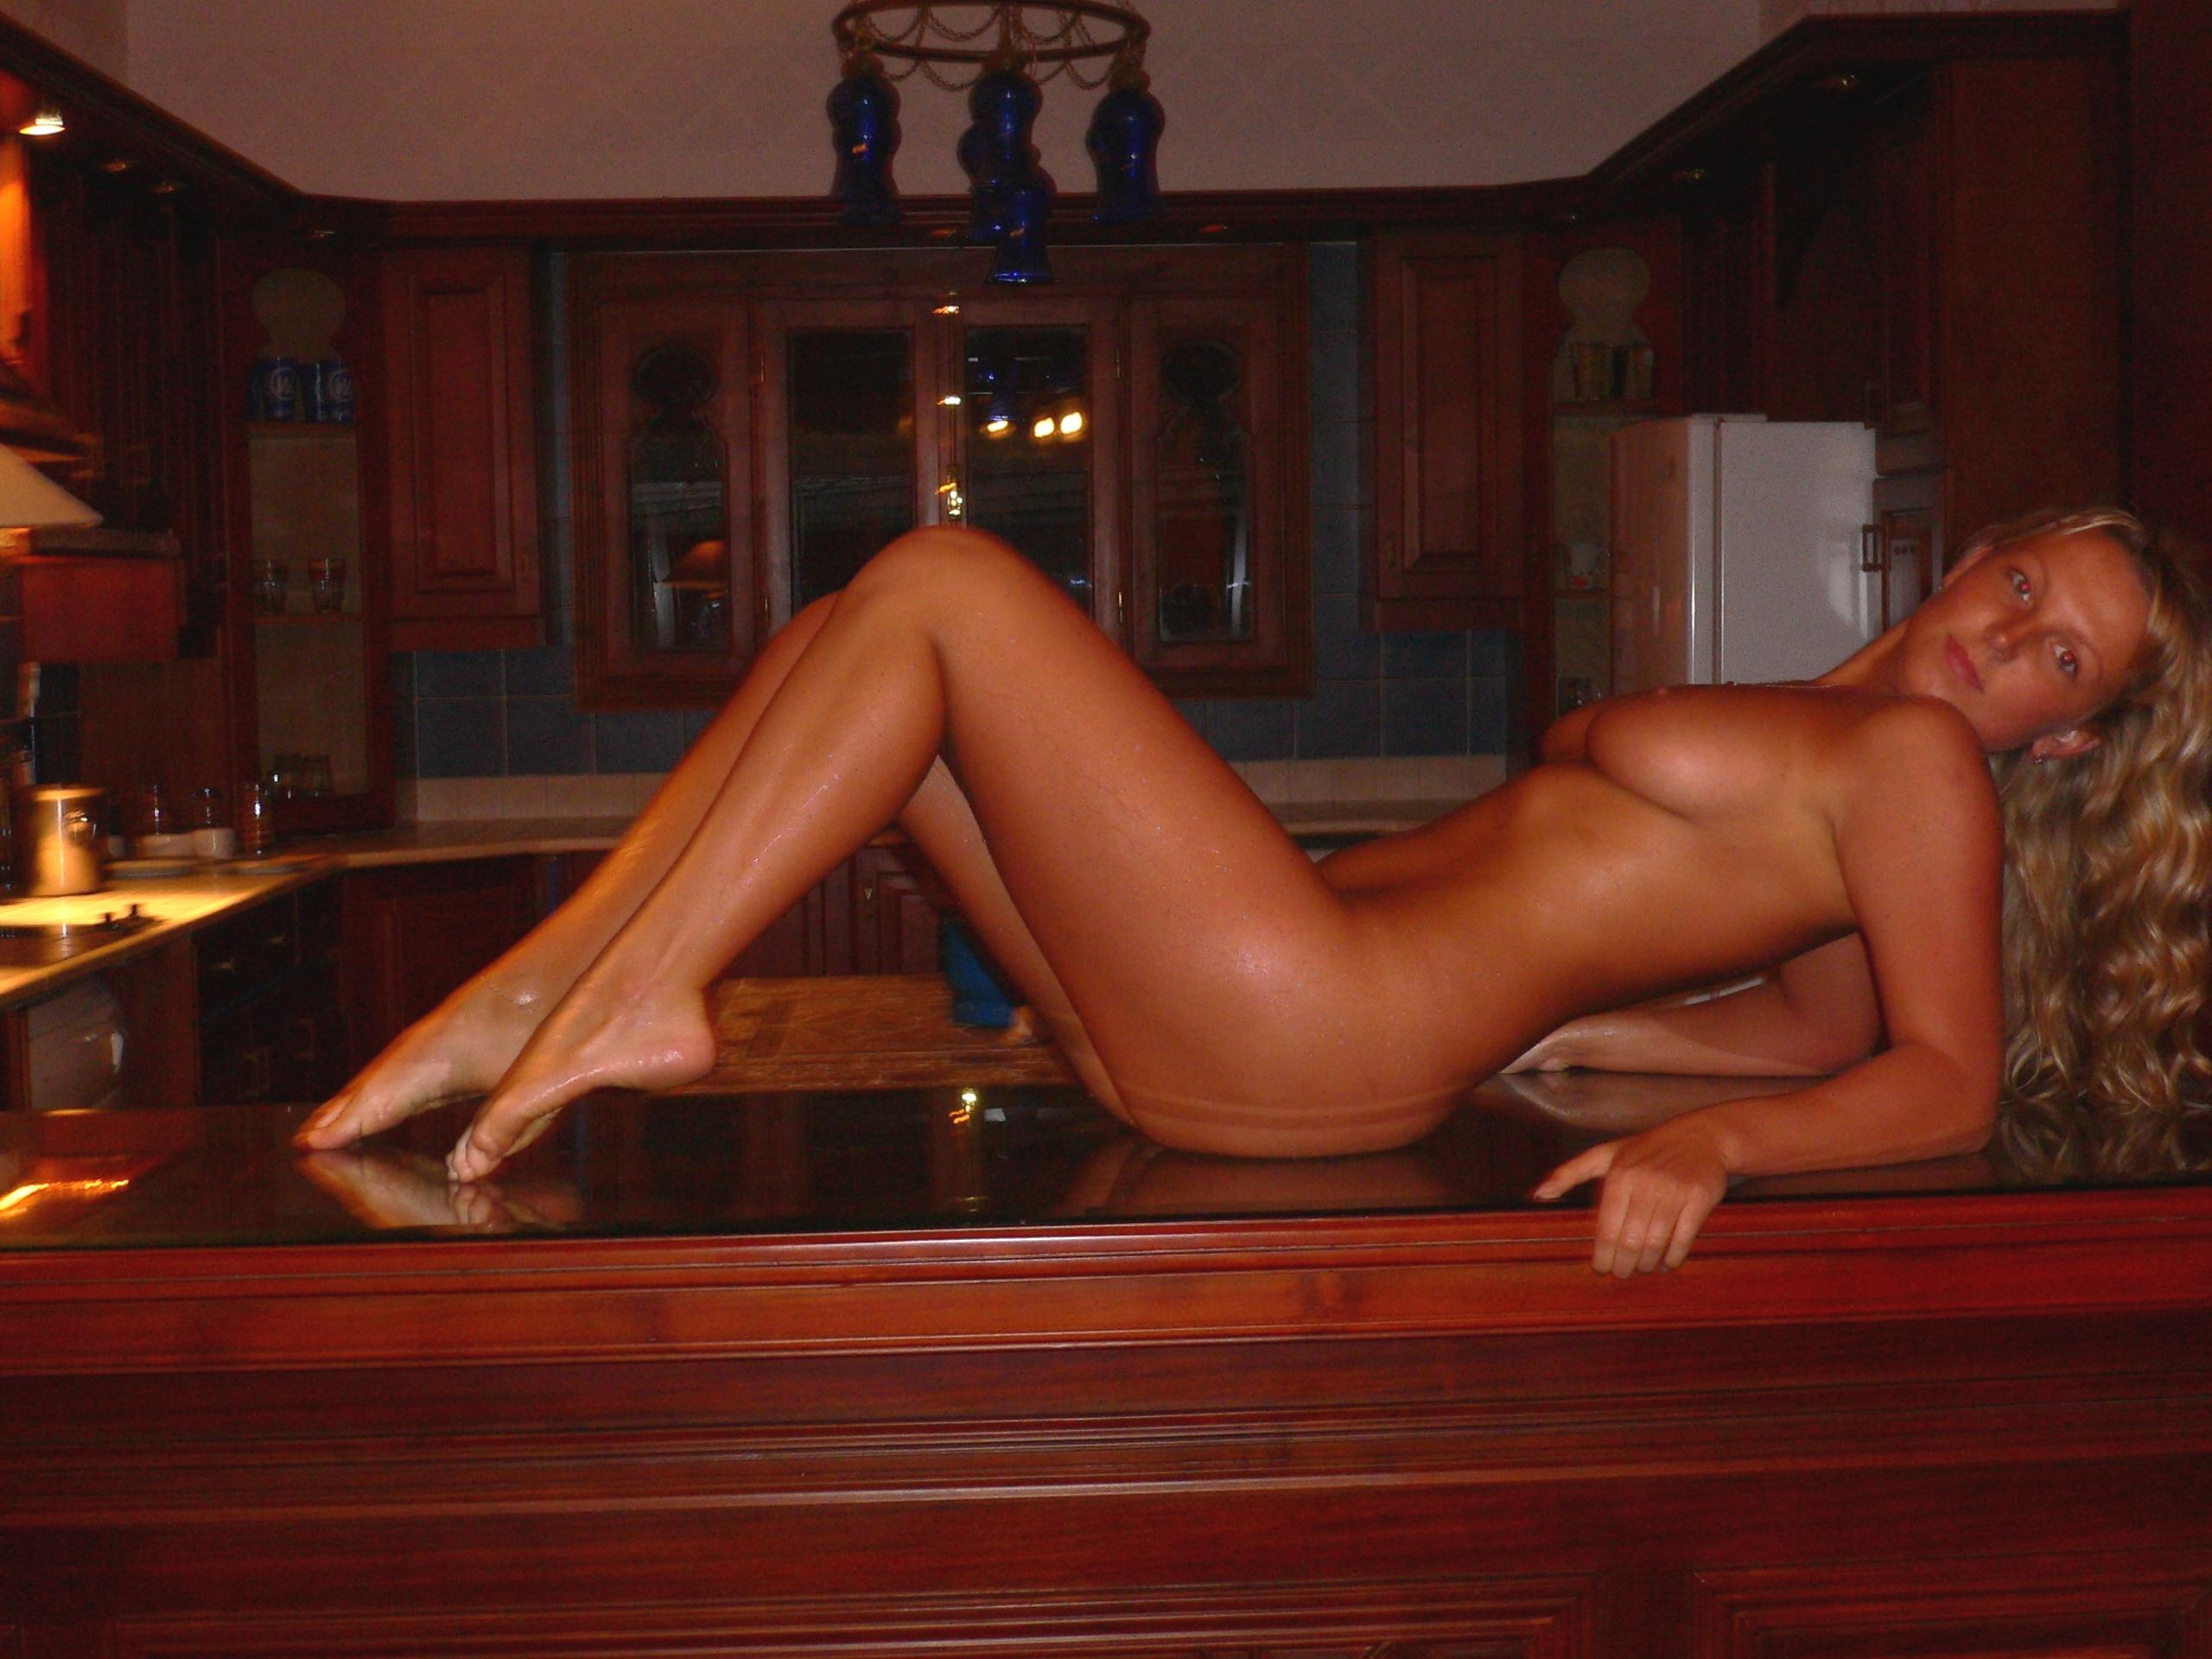 ex-girlfriend-nude-amateurs-girls-private-photo-mix-vol4-56